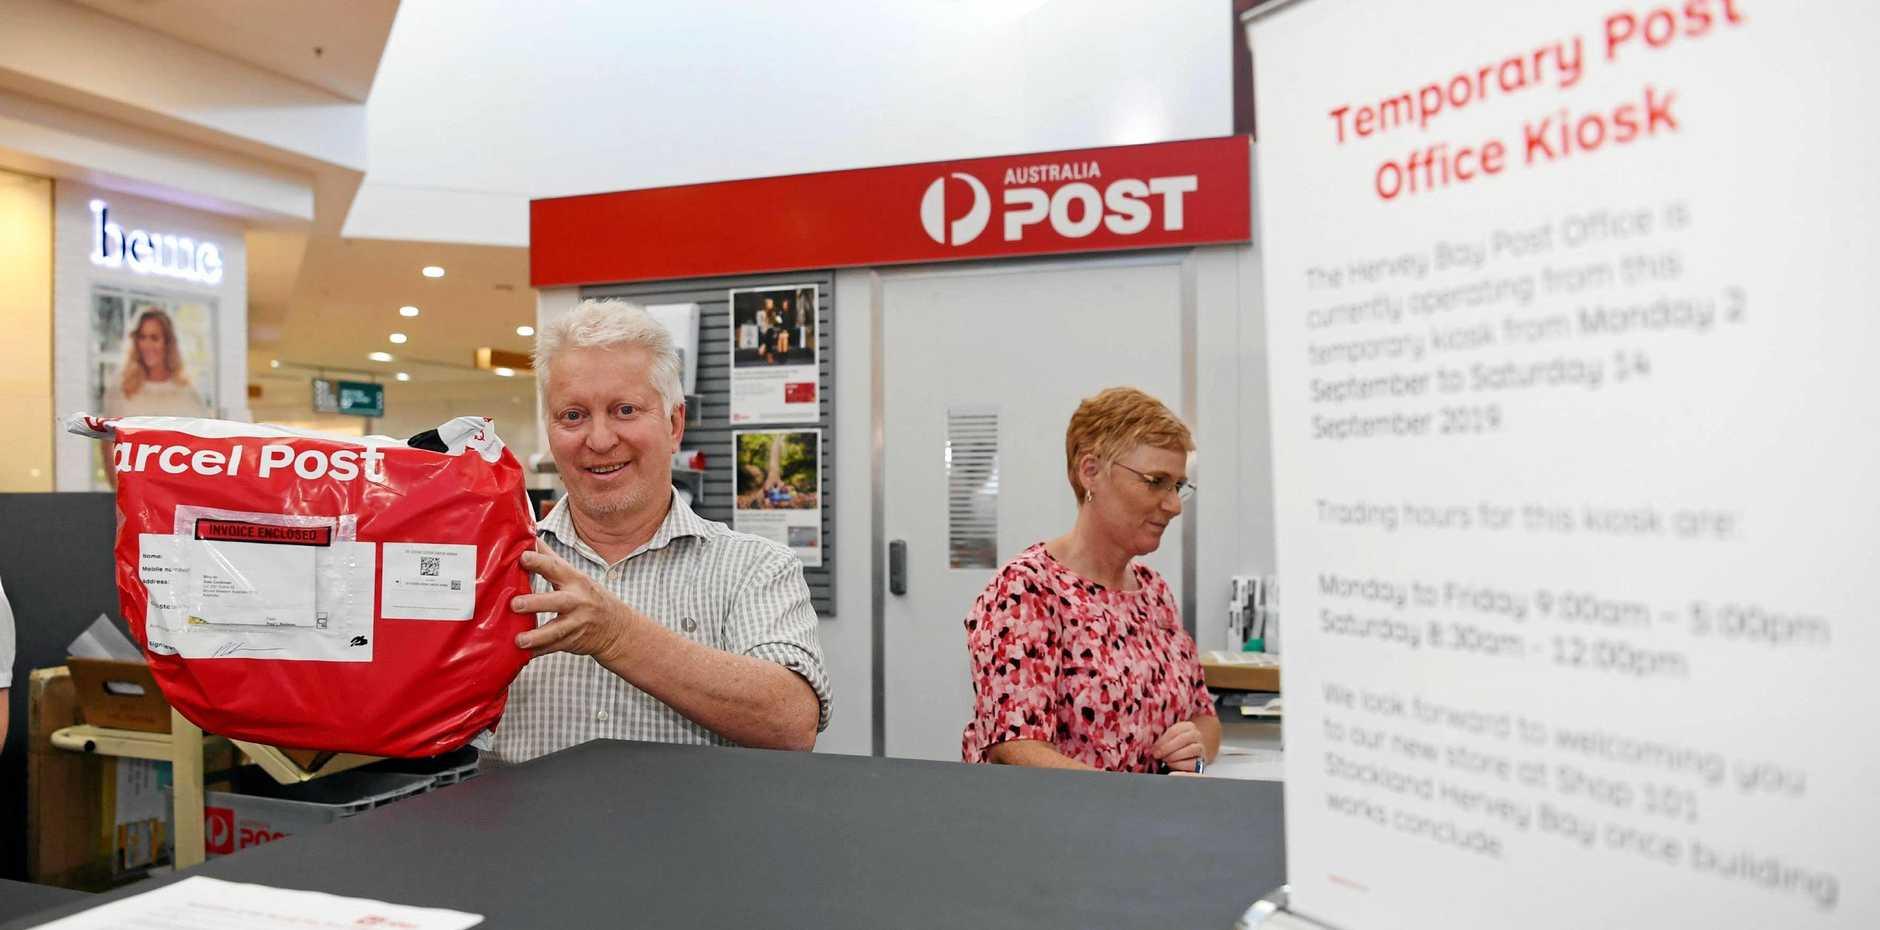 NEW DIGS: Supervisor John Watt gets to work at Australia Post's temporary office inside Stockland Hervey Bay.